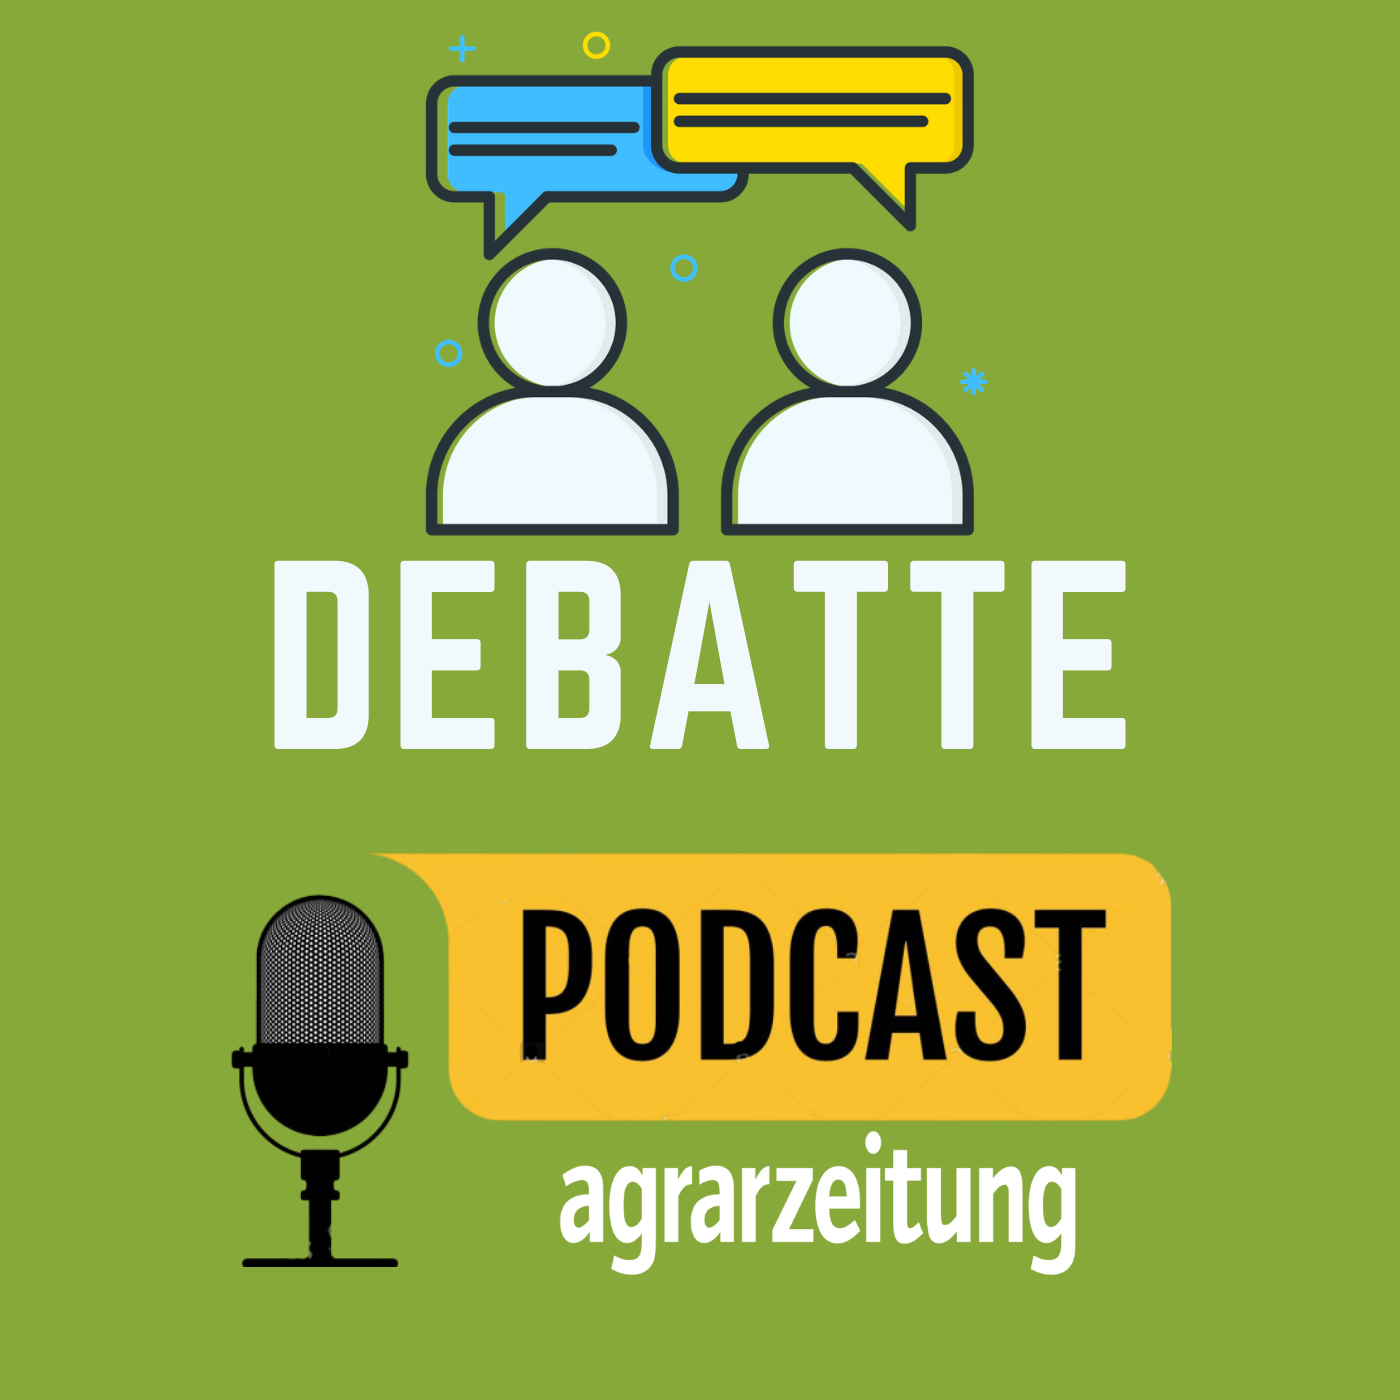 az-Podcast Debatte show art